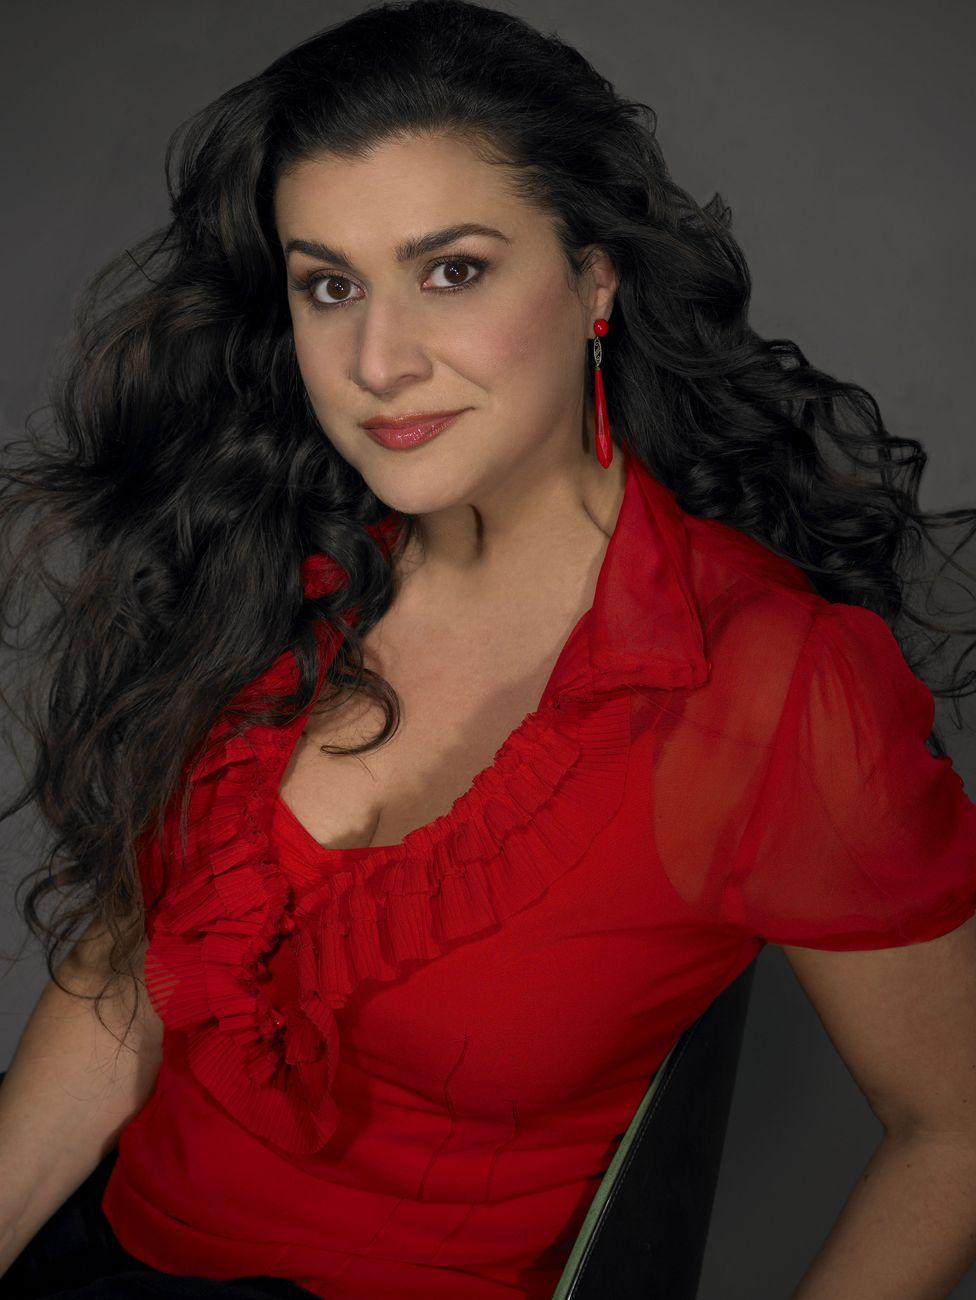 Cecilia Bartoli. Photo credits Uli Weber Decca. Courtesy Salzburger Festspiele